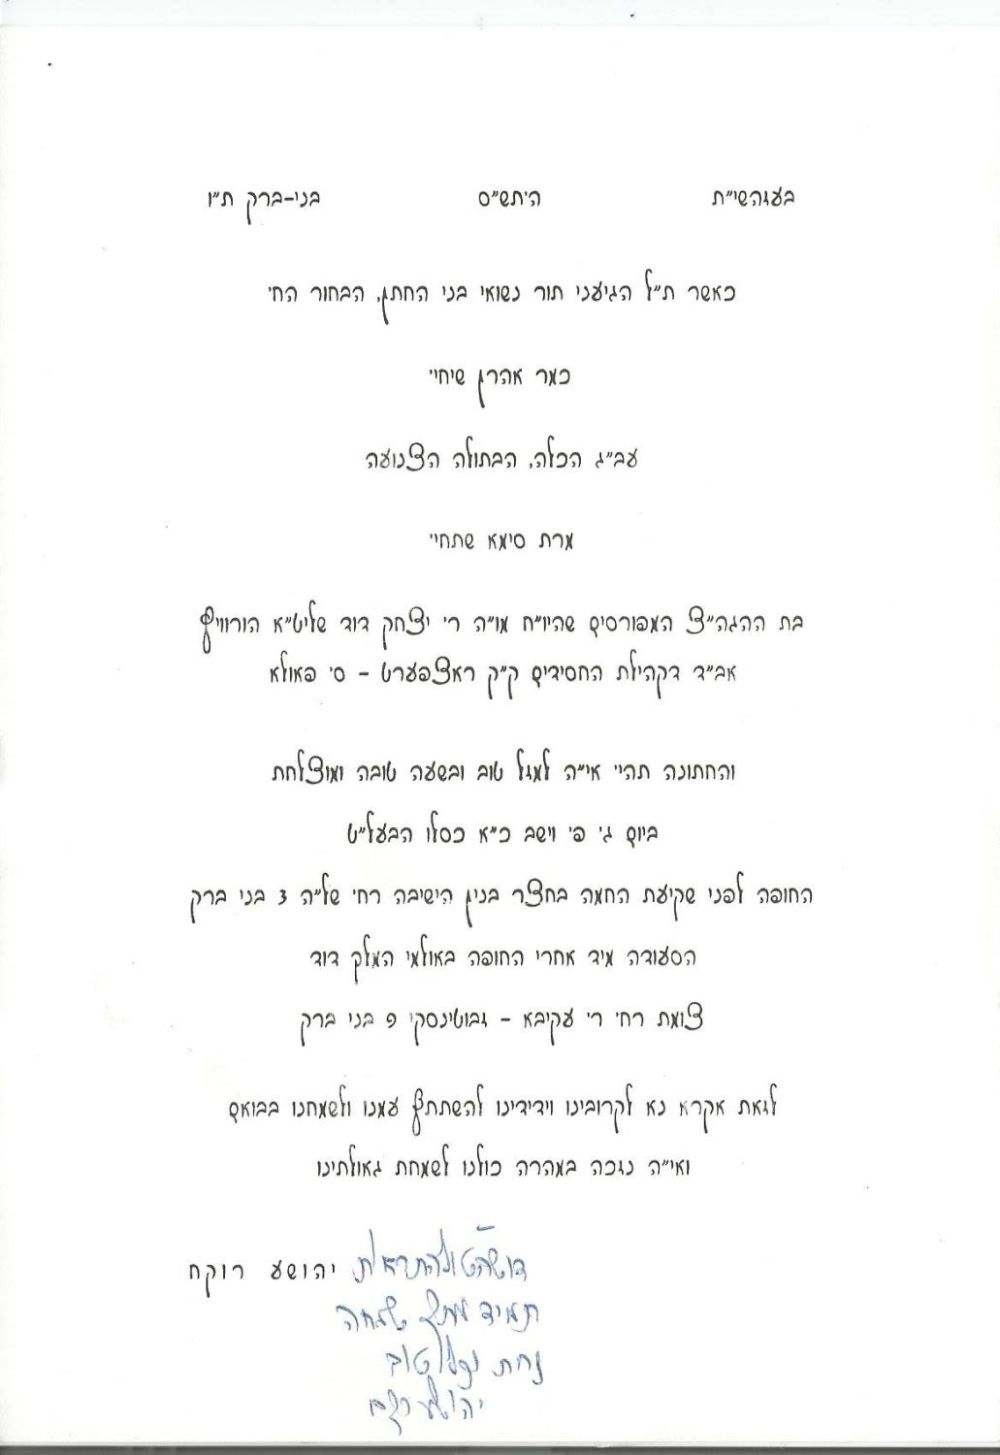 bidspirit - Genazym - Invitation to the wedding of